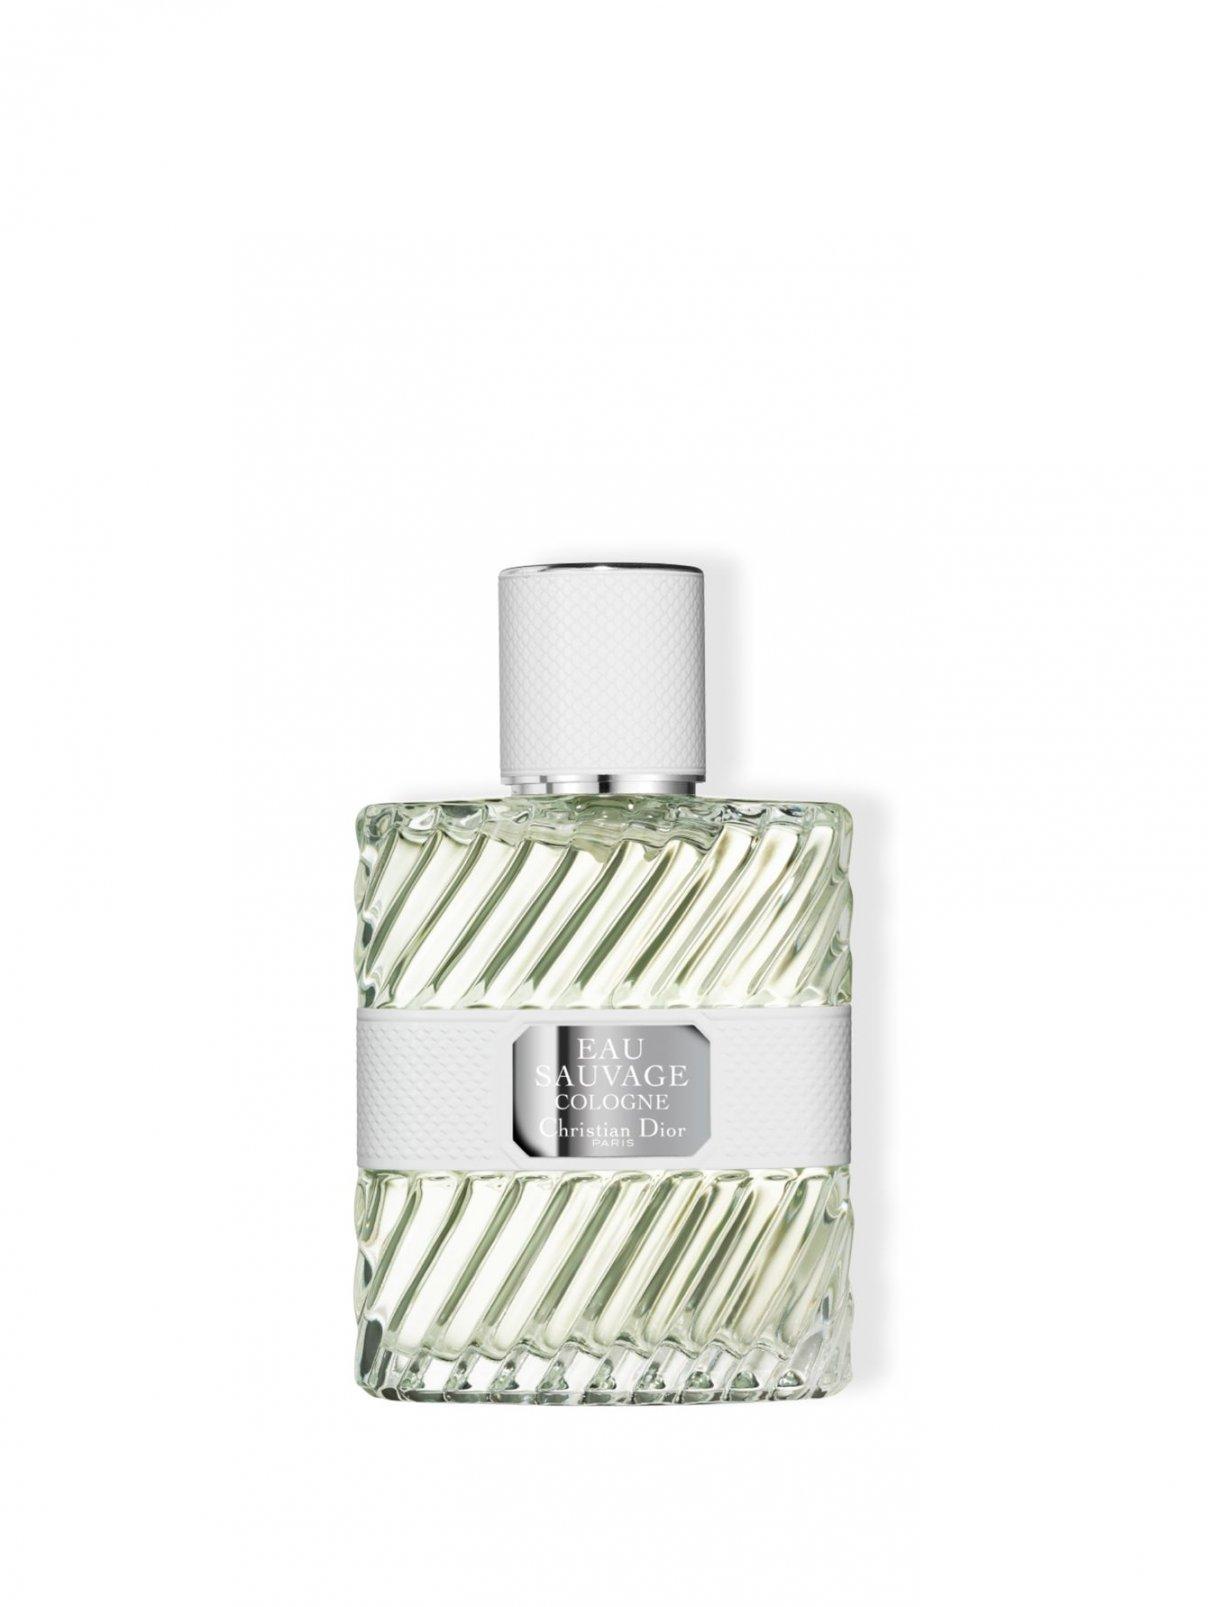 Парфюмерия Eau Sauvage Dior  –  Общий вид